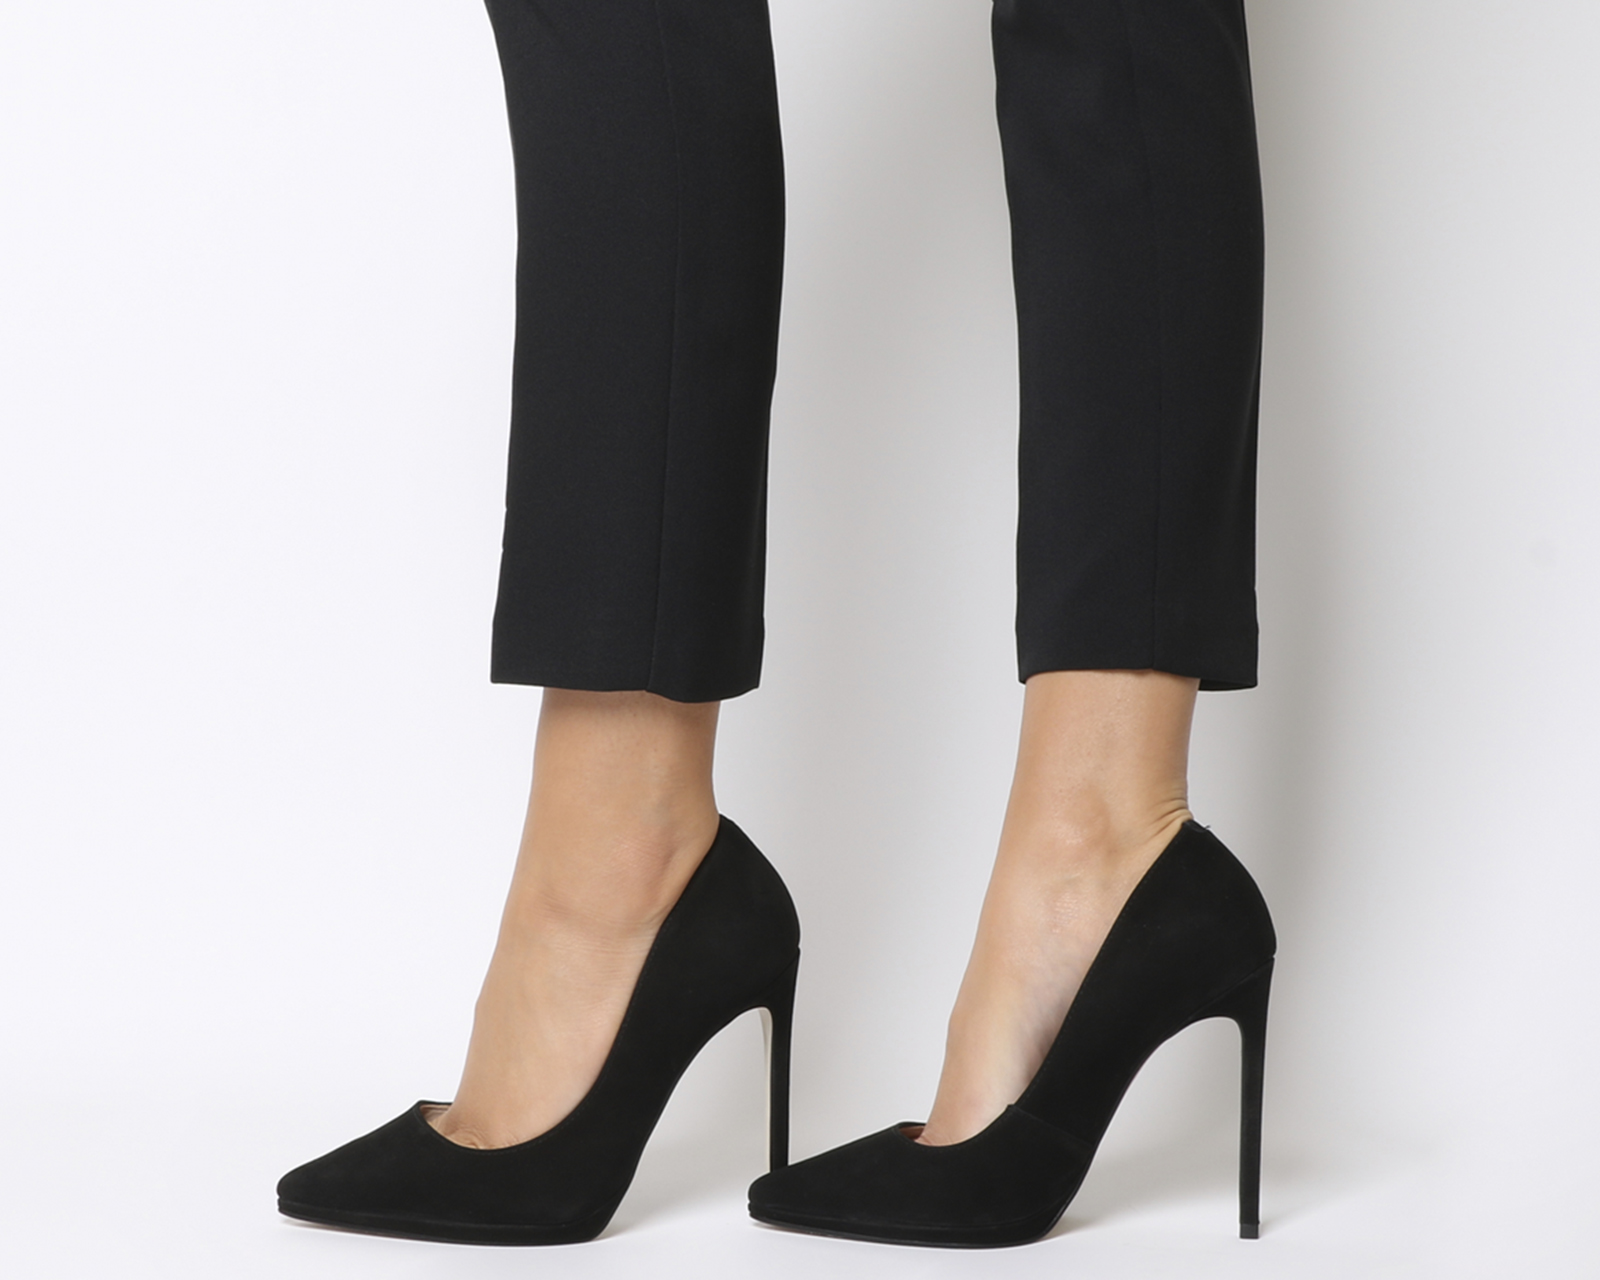 Damenschuhe Office Hi-ya Pointed Platform Stiletto NUBUCK Heels BLACK NUBUCK Stiletto Heels 4443f1